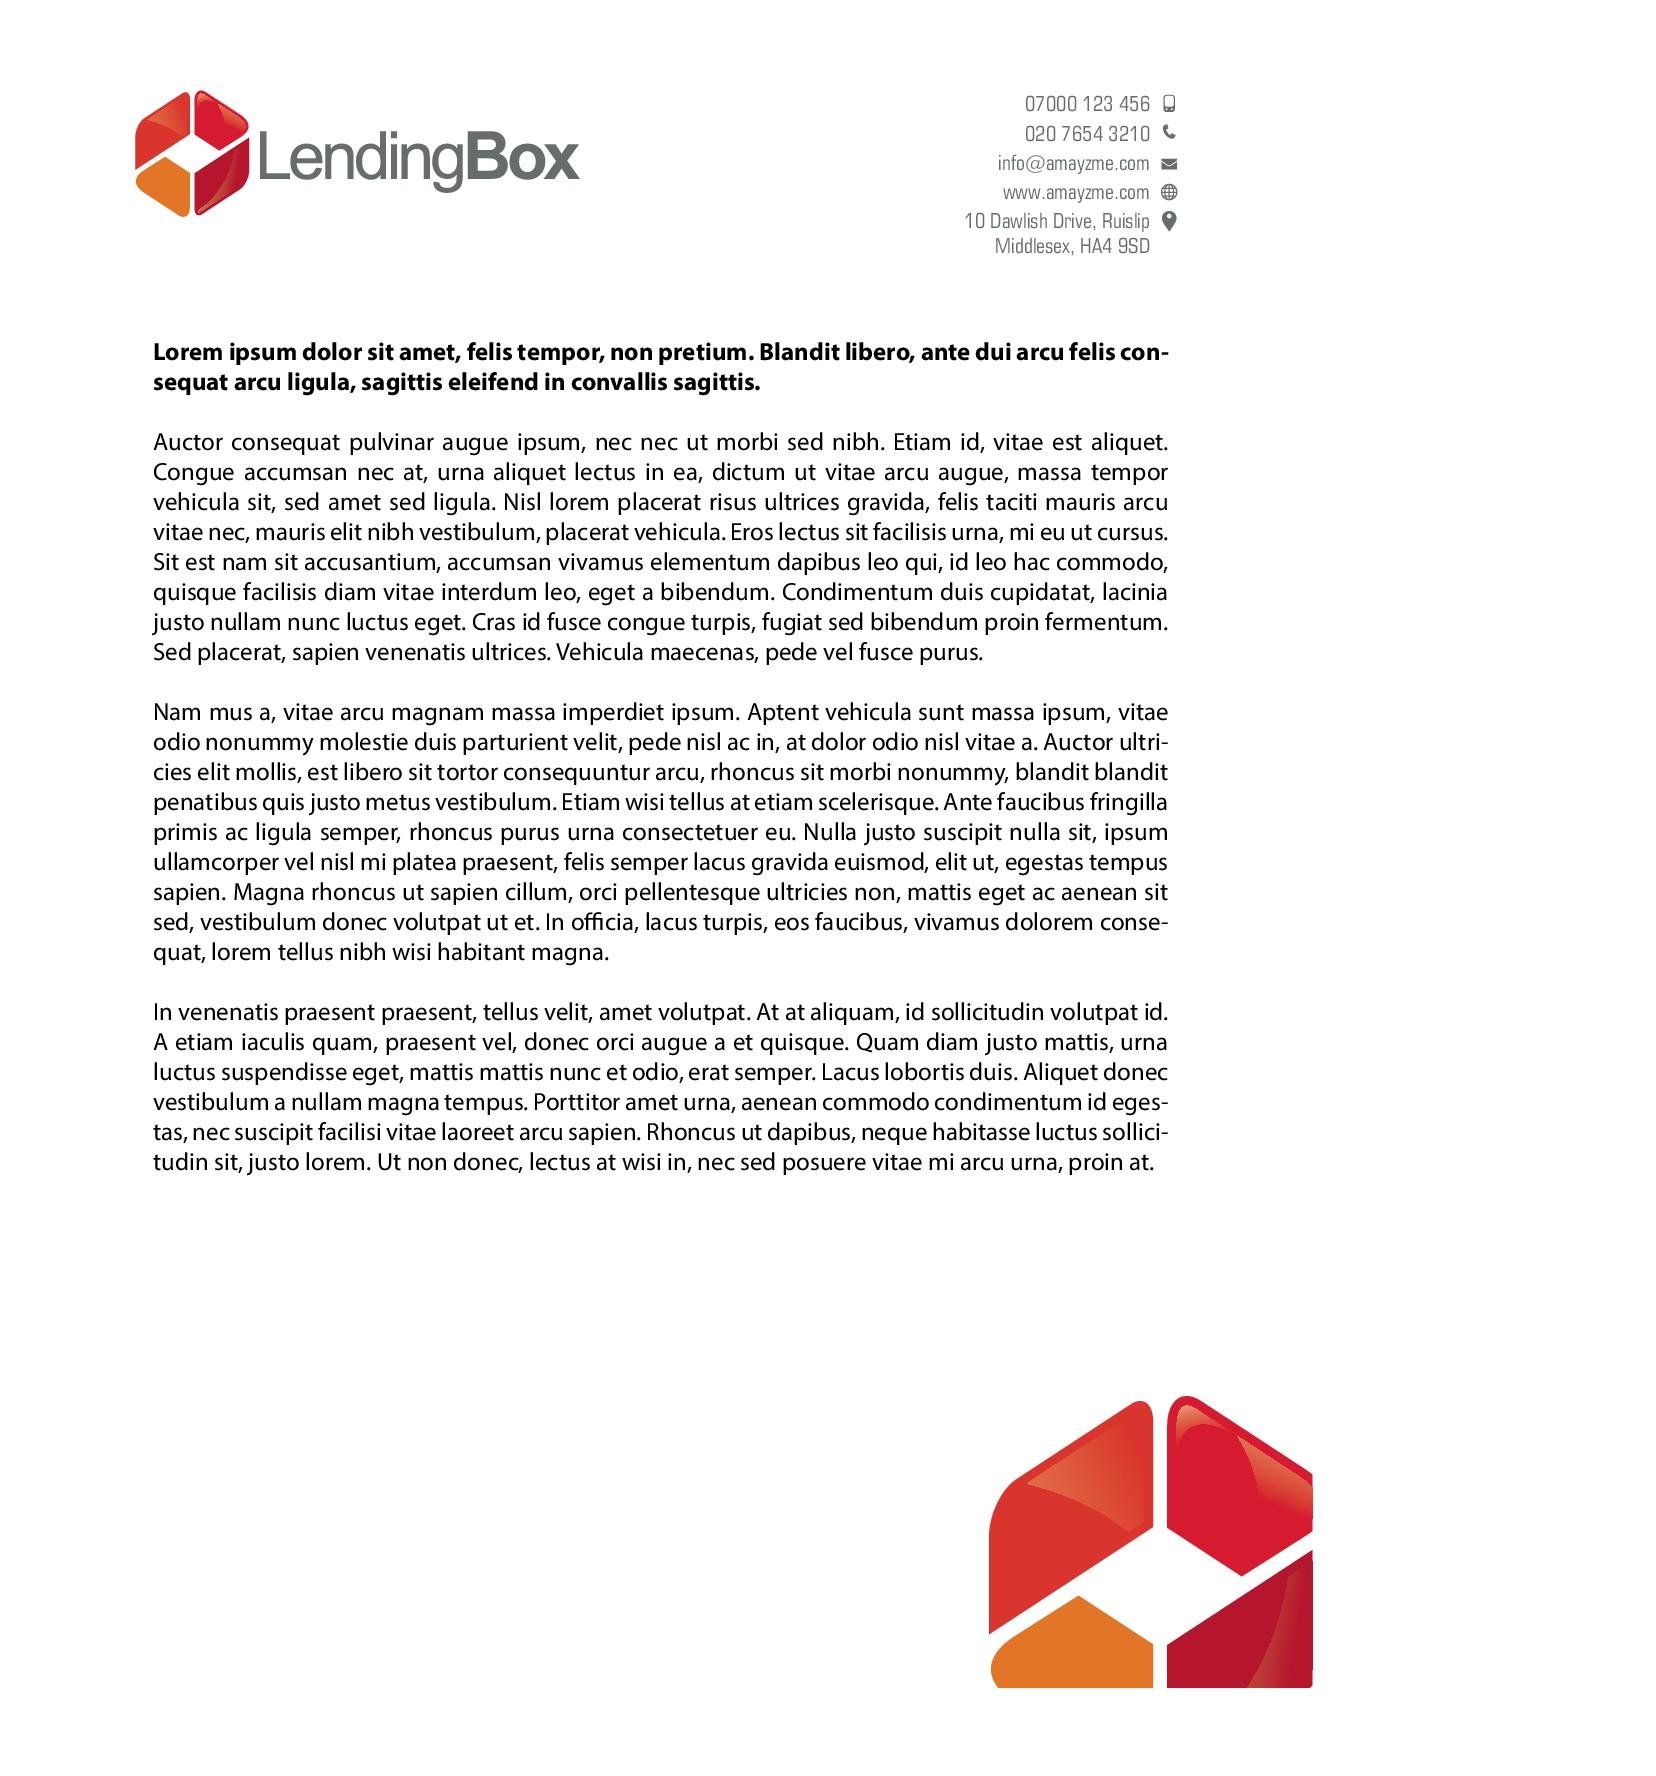 Create brand book for LendingBox